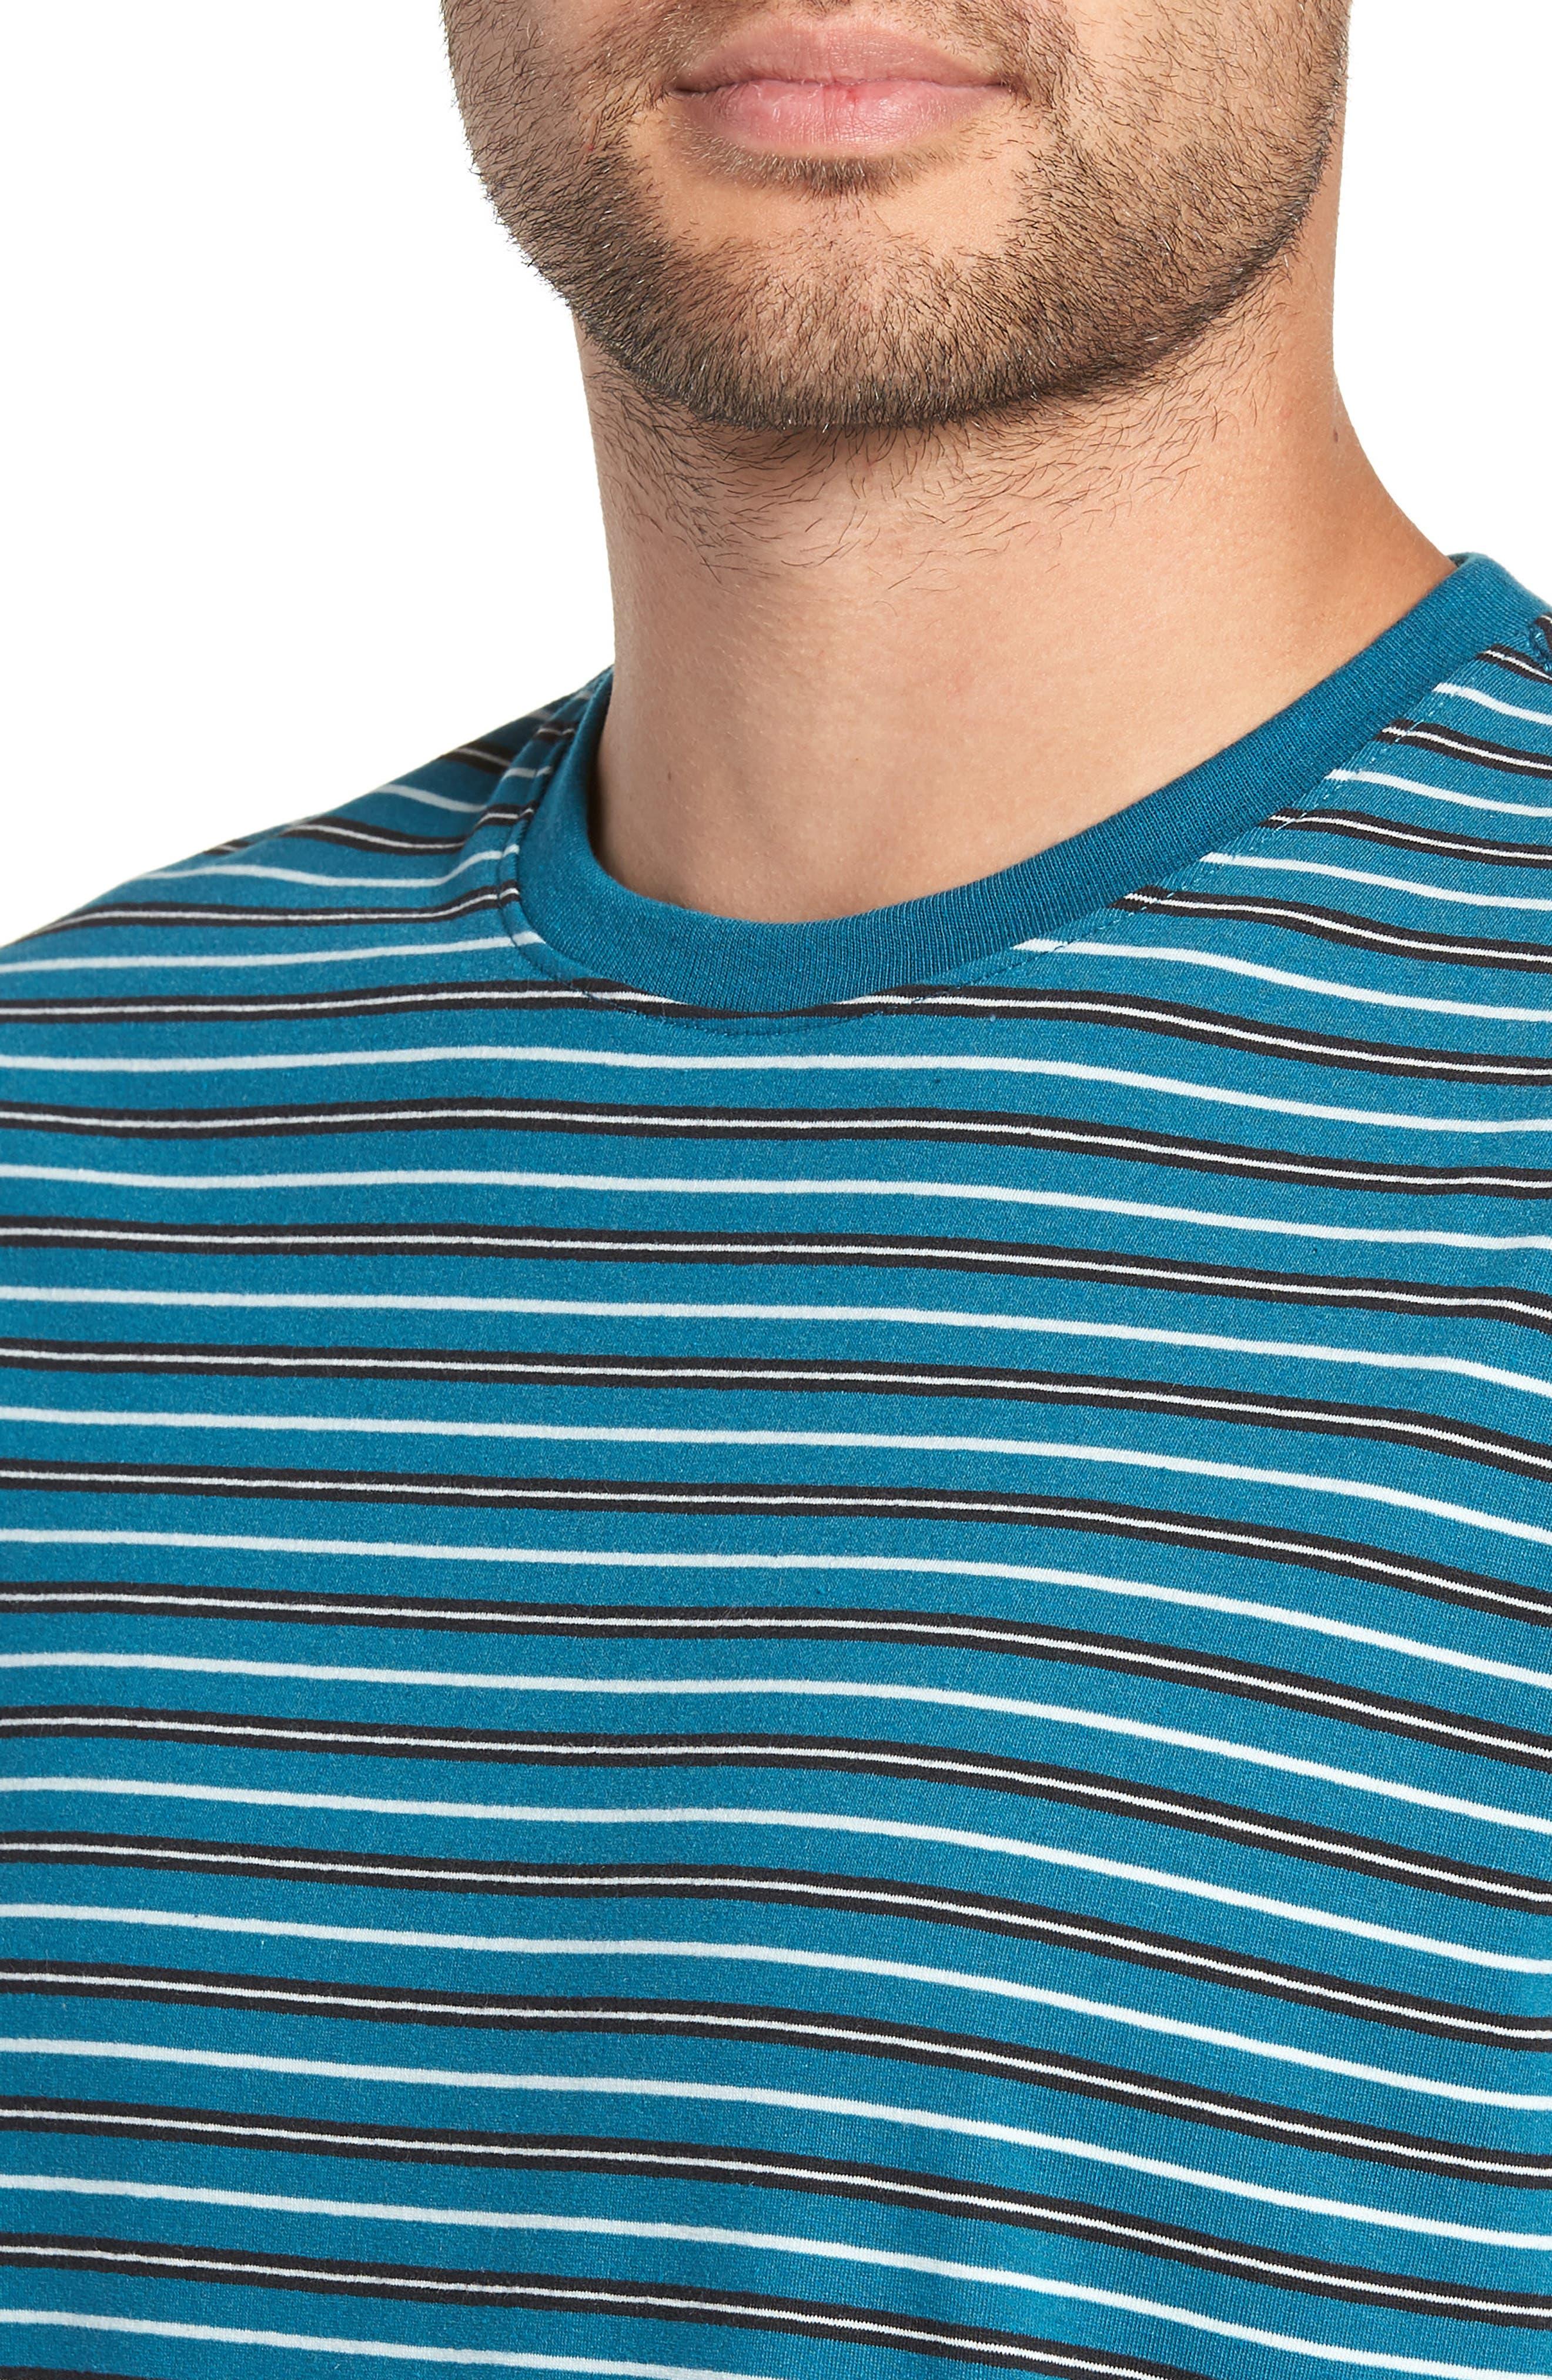 Striped T-Shirt,                             Alternate thumbnail 4, color,                             TEAL GREEN-WHITE STRIPE